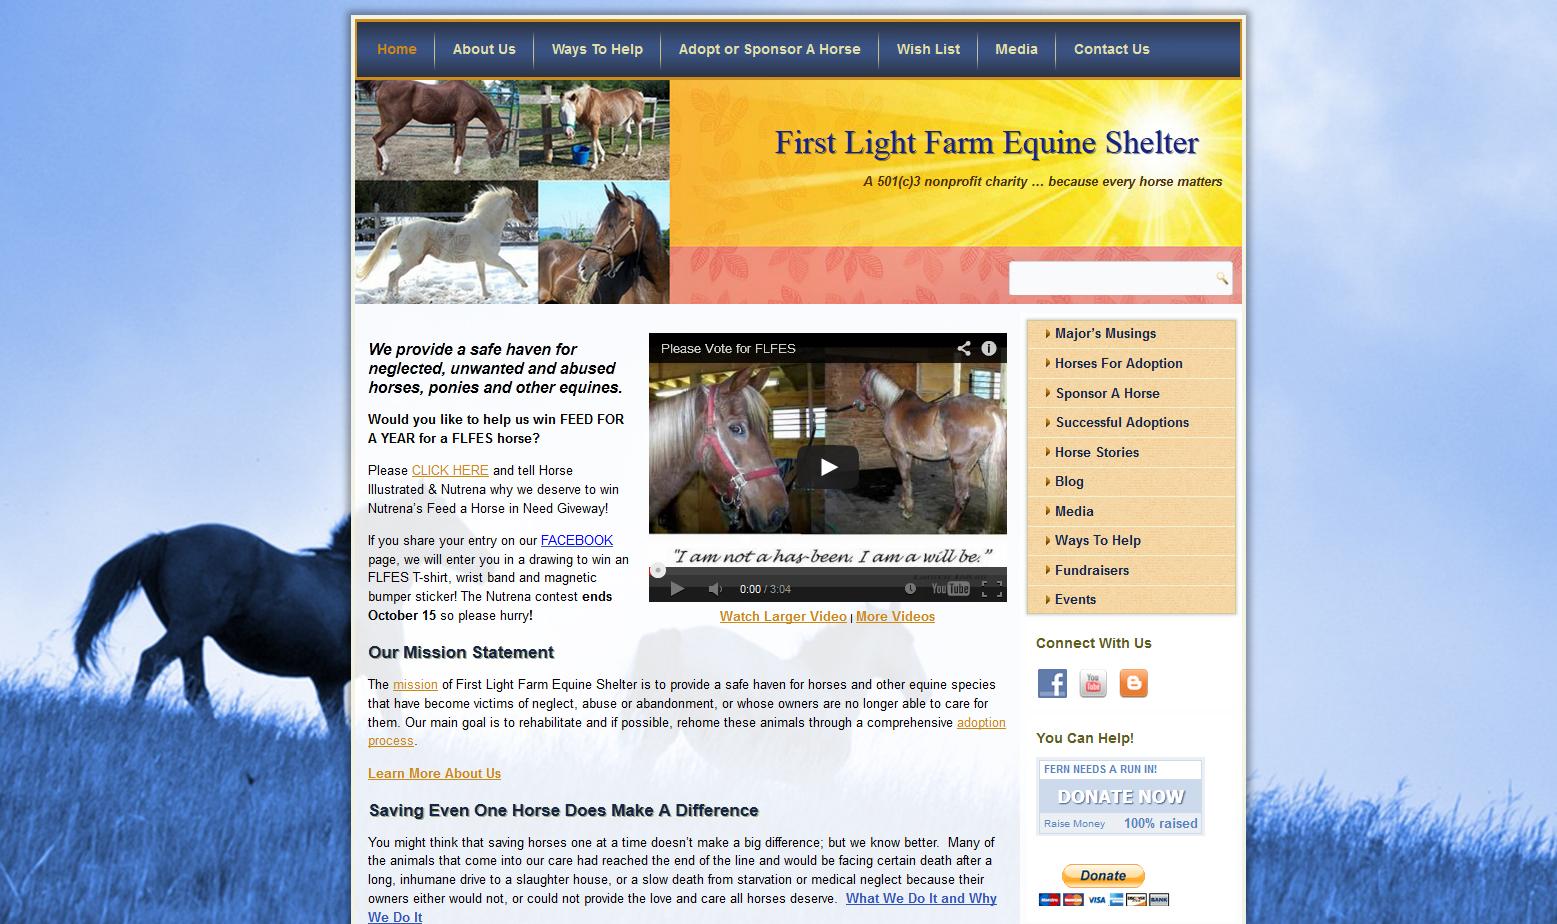 First Light Farm Equine Shelter, Pro Bono Horse Website Design